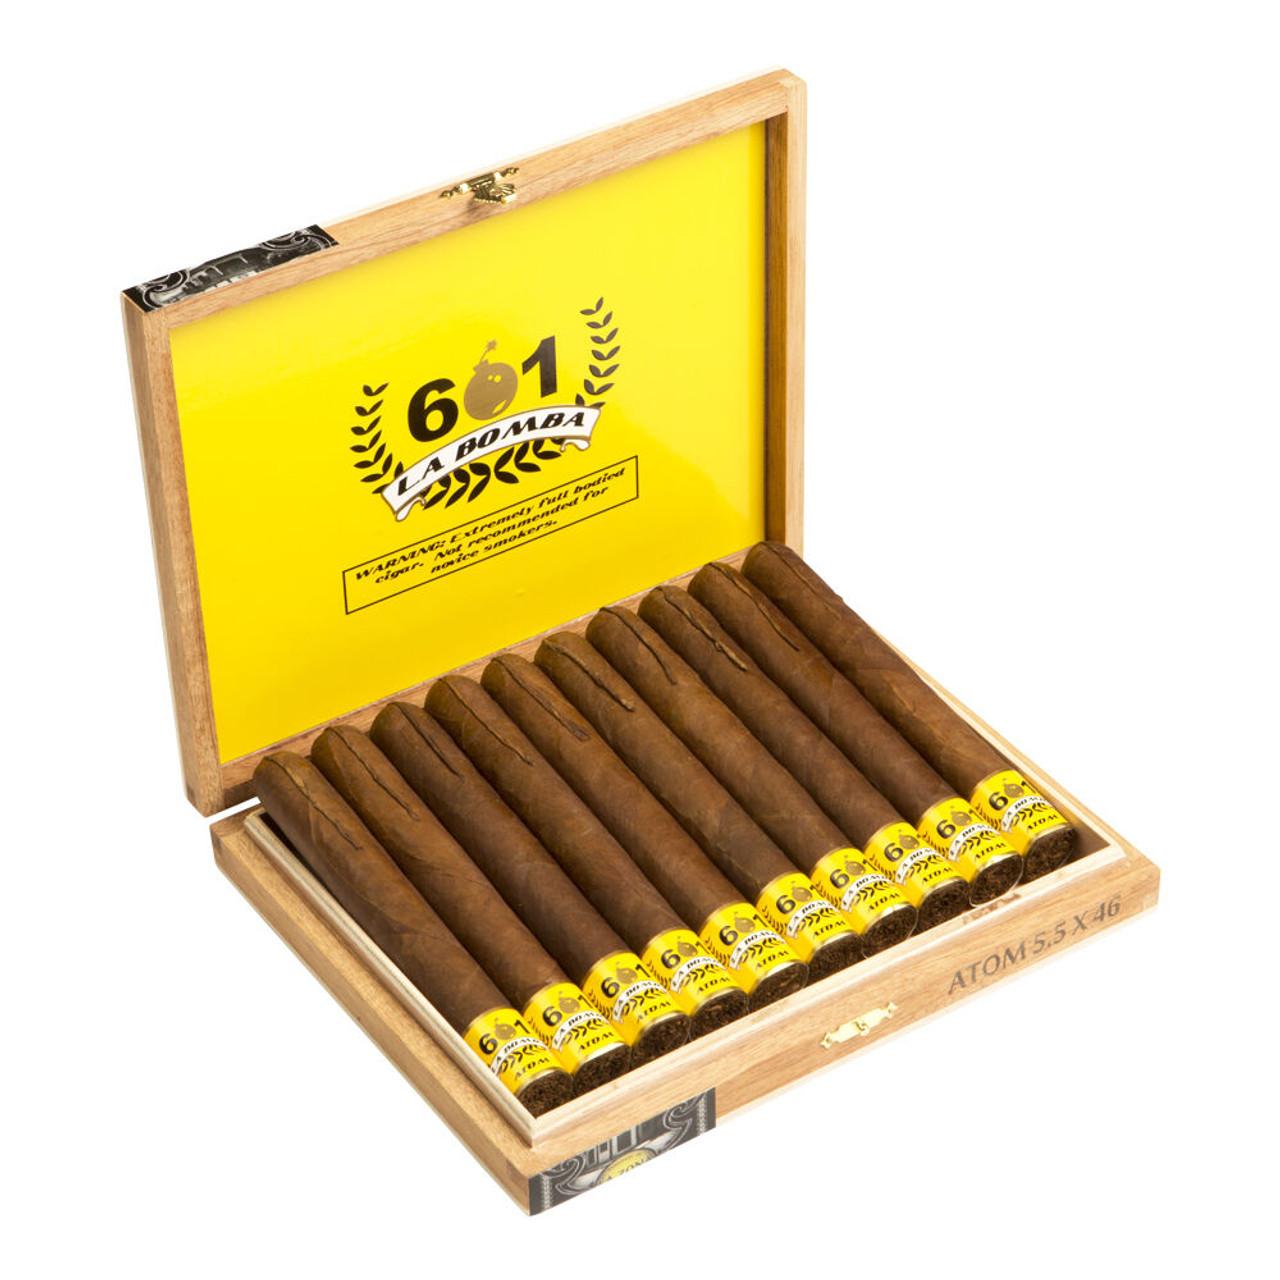 601 La Bomba Nuclear - 6 x 50 Cigars (Box of 10)